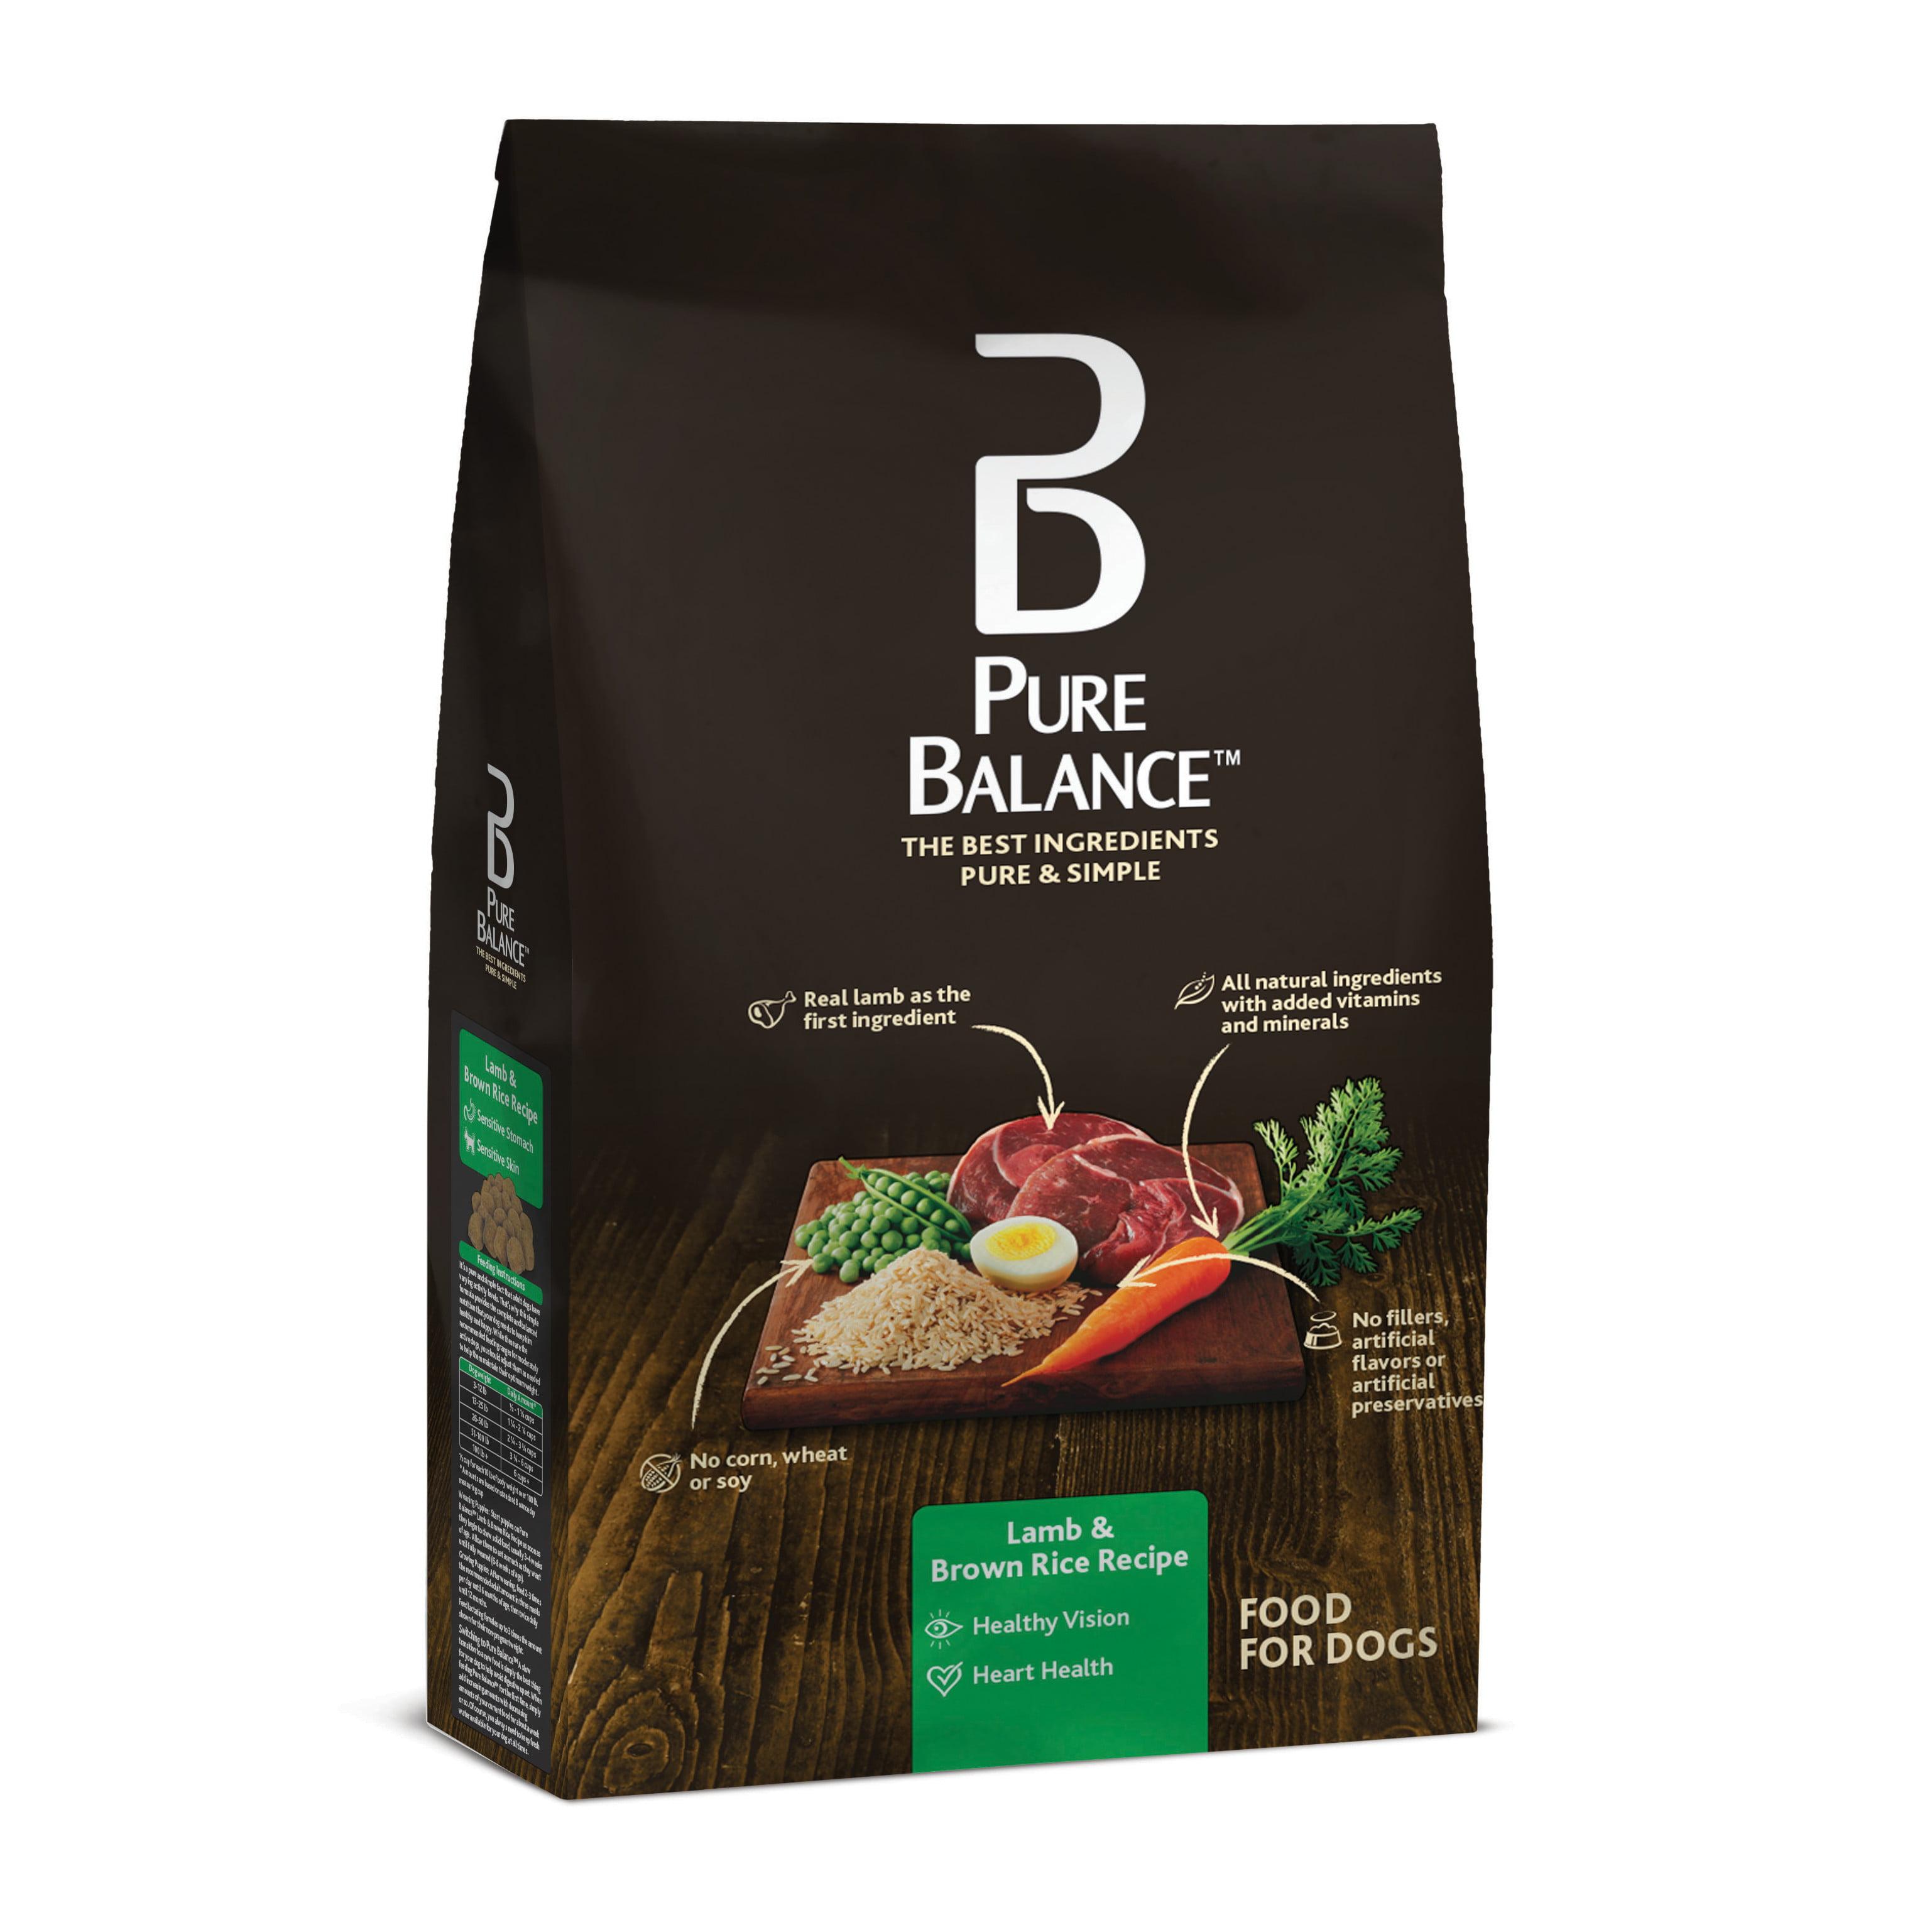 Pure Balance Lamb & Brown Rice Dry Dog Food, 30 Lb